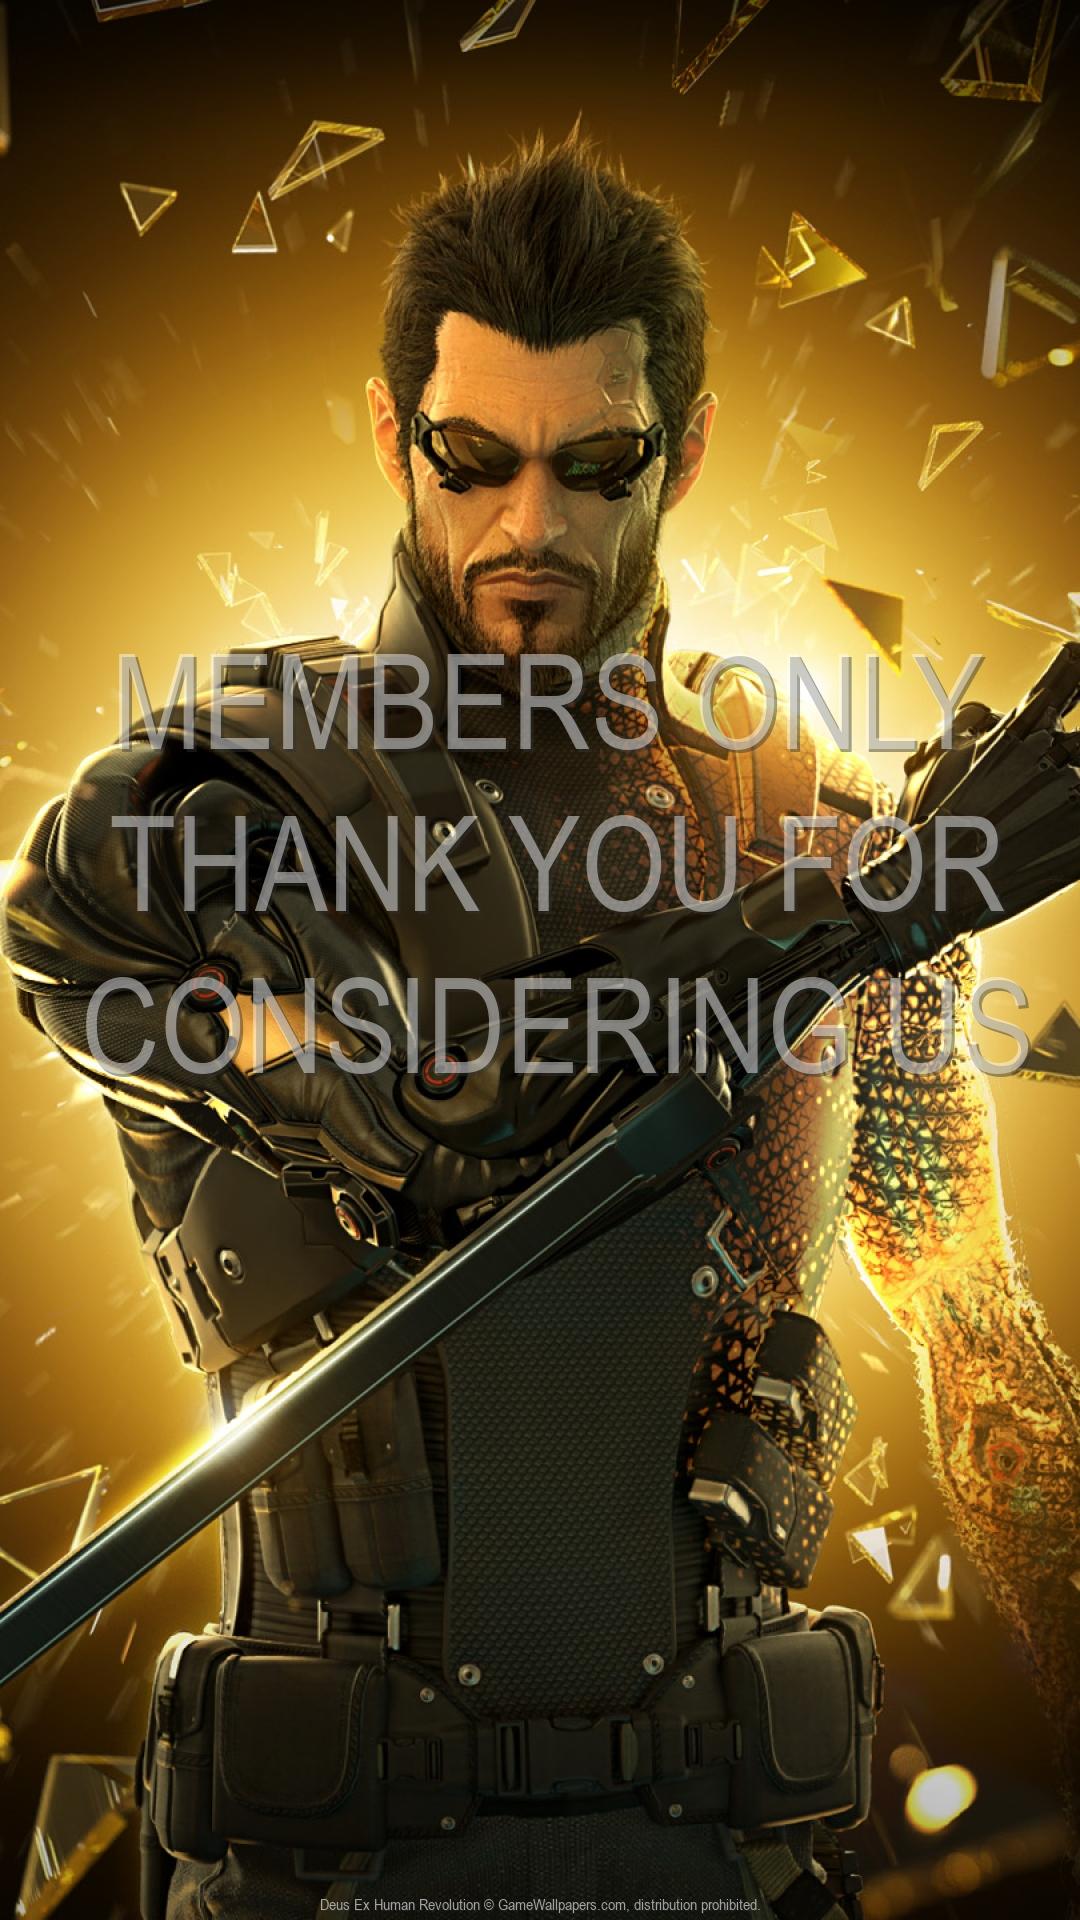 Deus Ex: Human Revolution 1920x1080 Handy Hintergrundbild 10